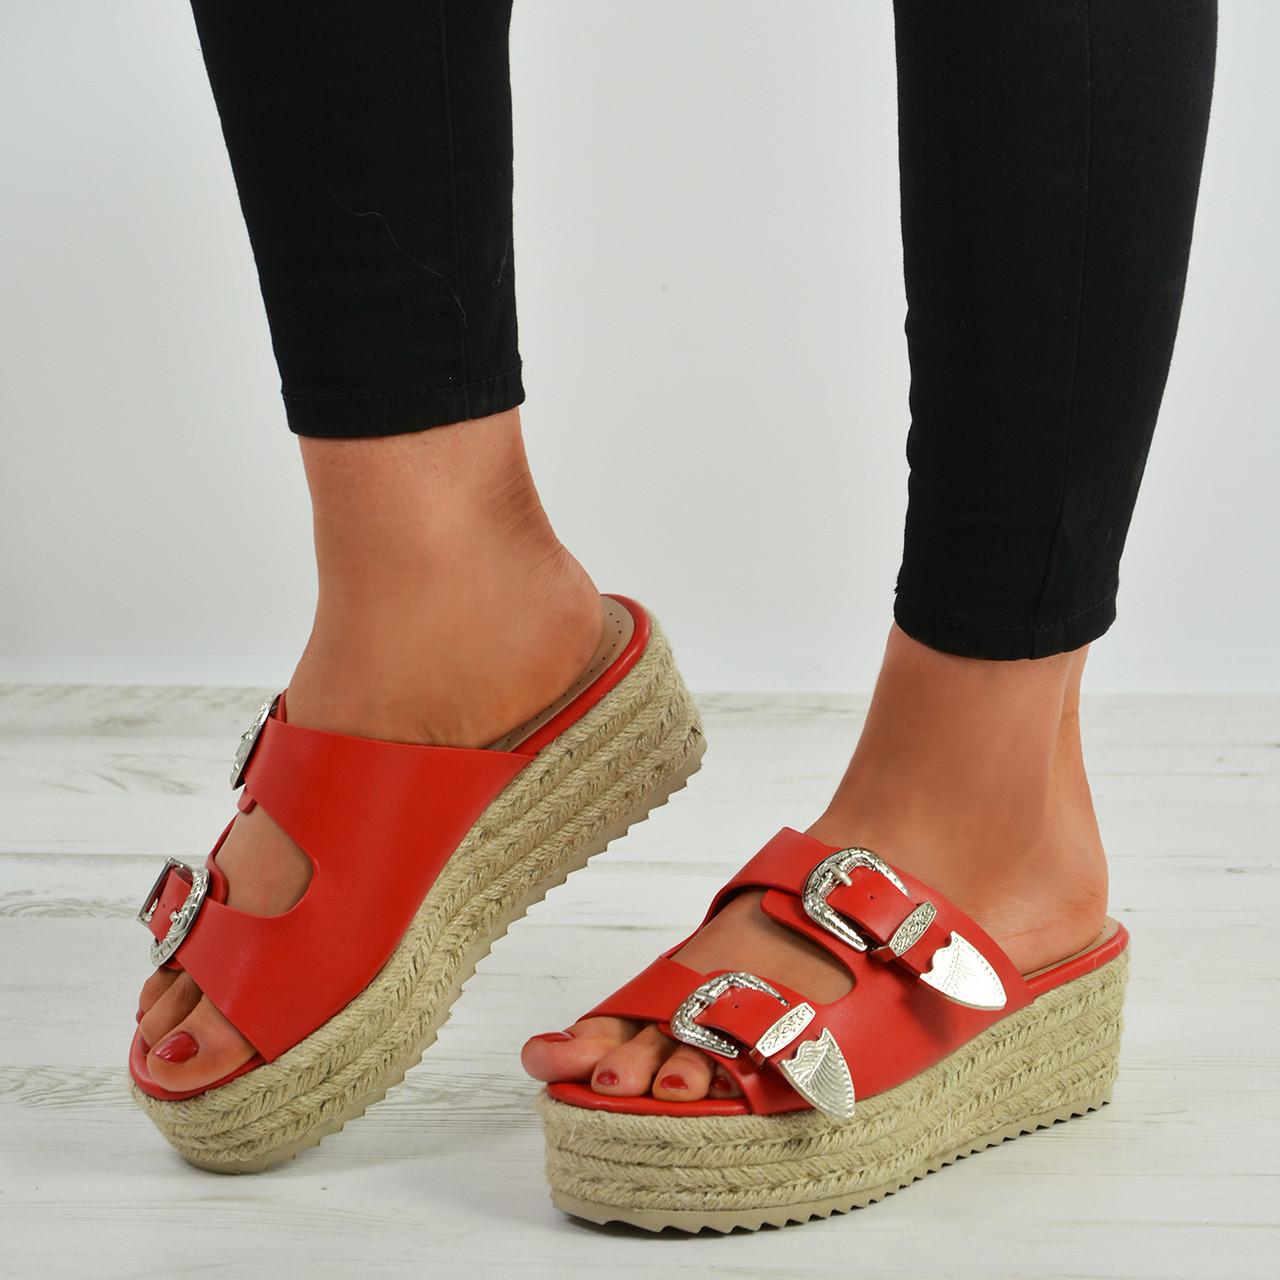 f1d144b1d00c New Womens Slip On Wedge Espadrille Platform Sandals Ladies Peep Toe Shoes